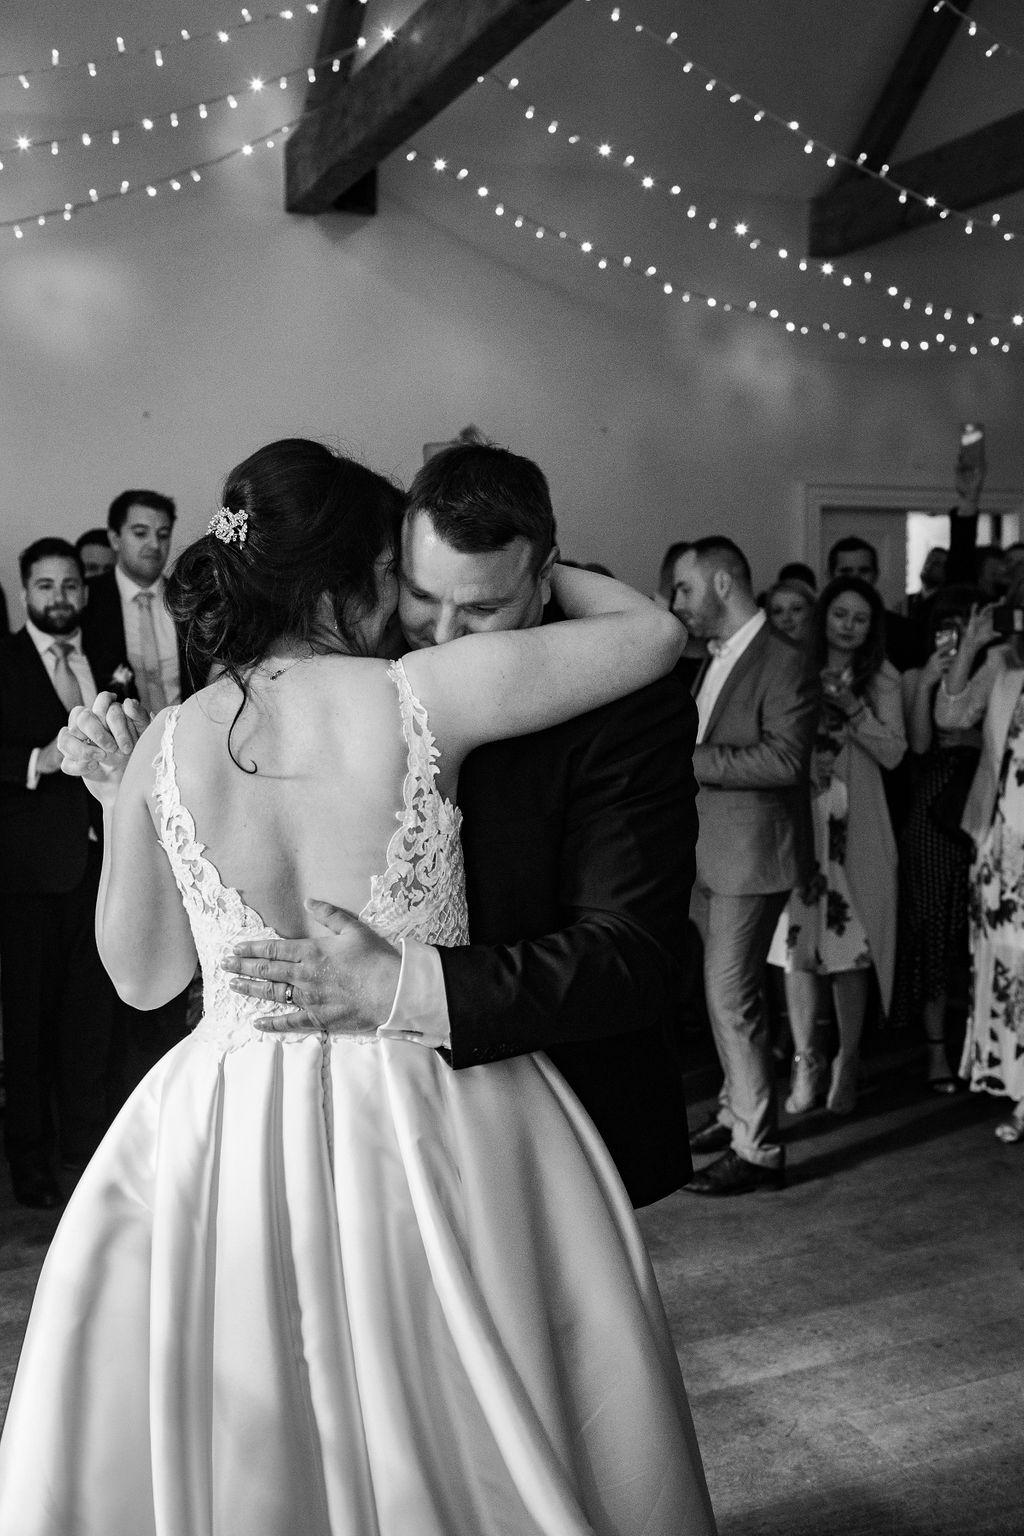 Your_Wedding_Day_537.jpg